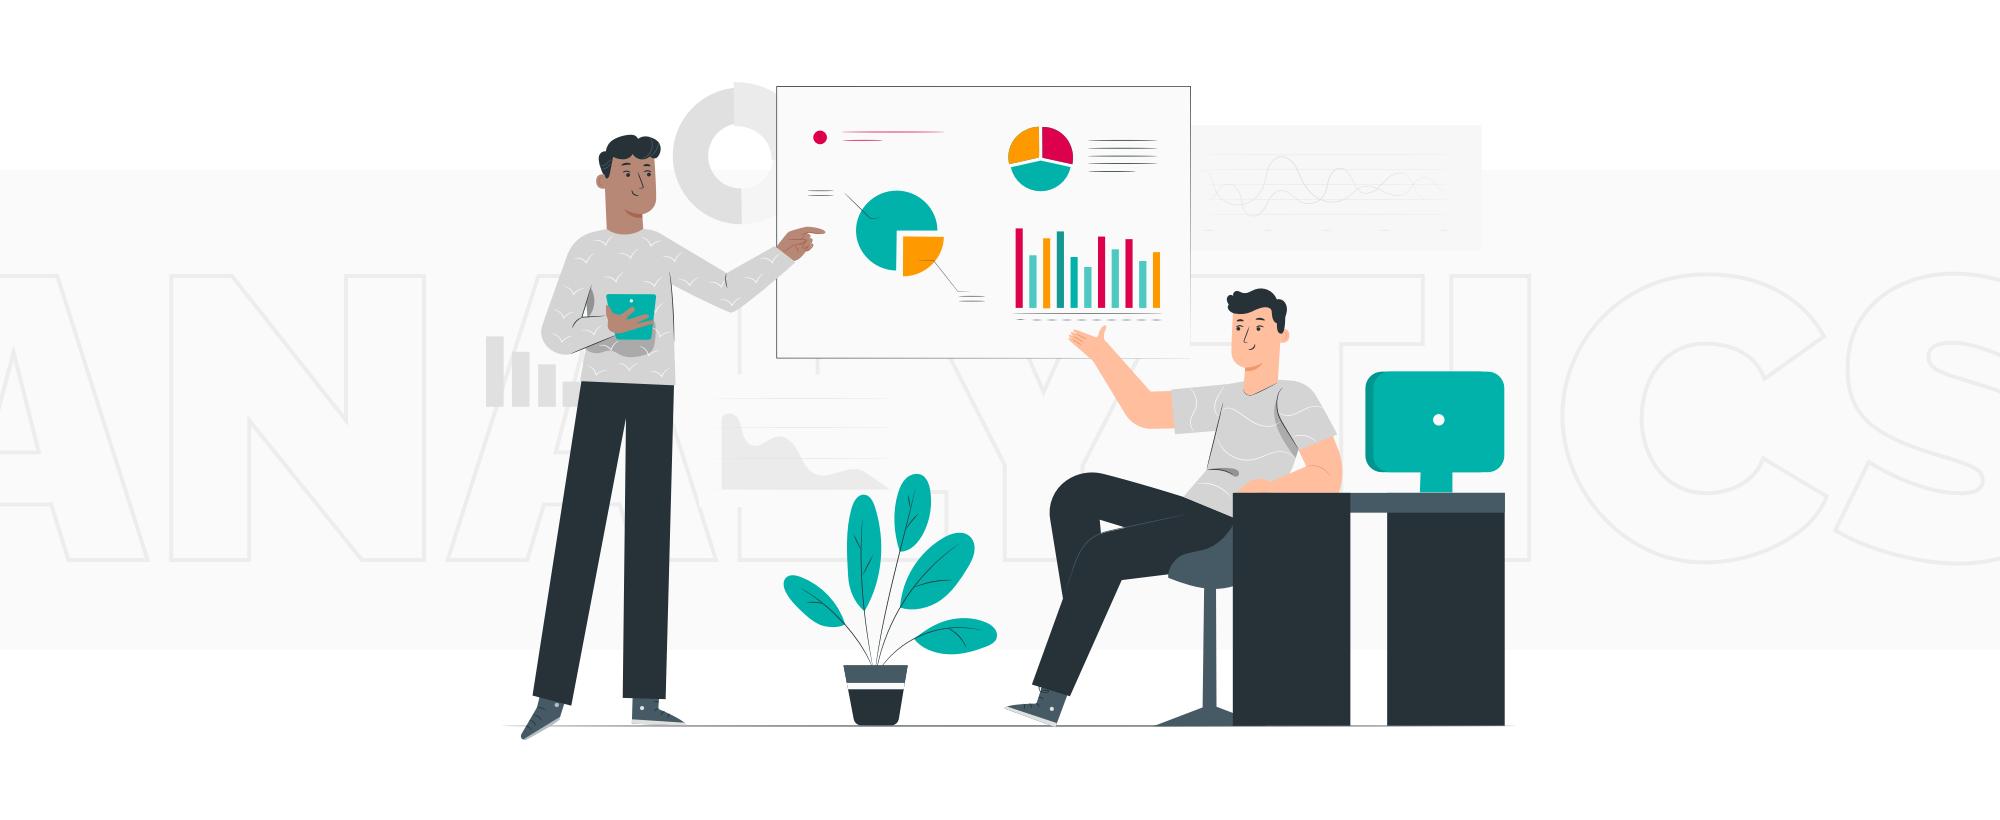 People analytics tools   TechMagic.co